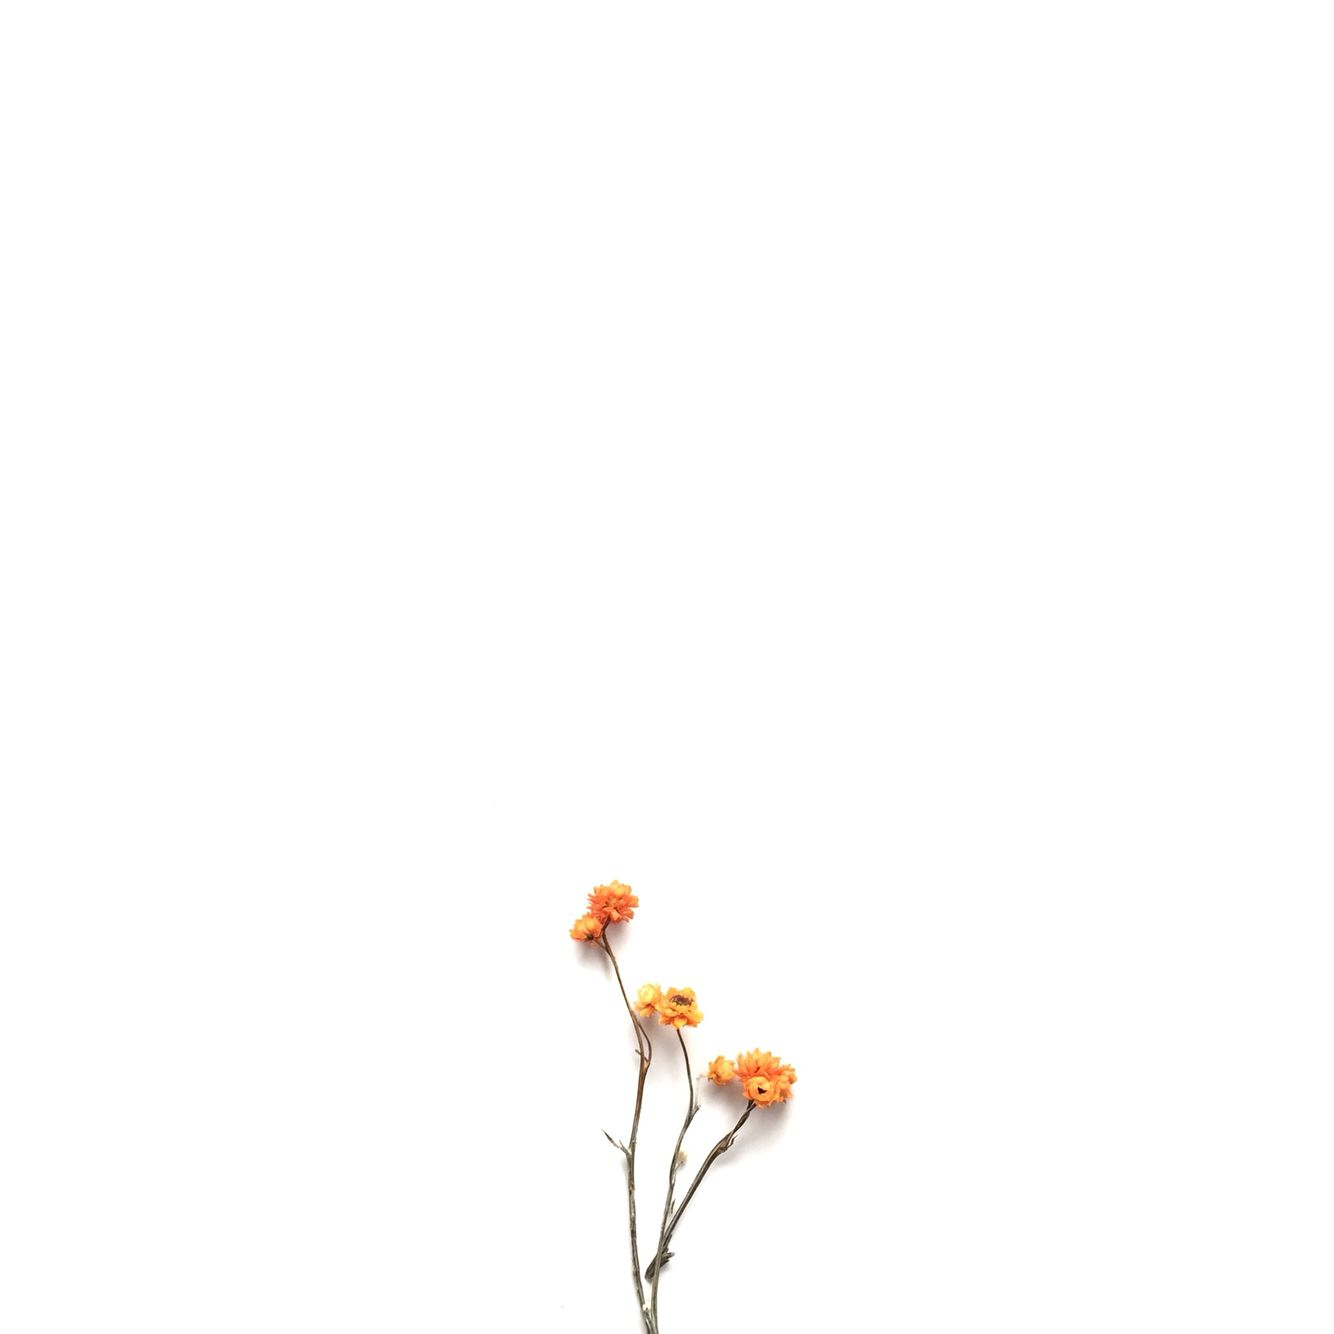 Flower Orange White Background White Background Wallpaper White Background Quotes White Background Images